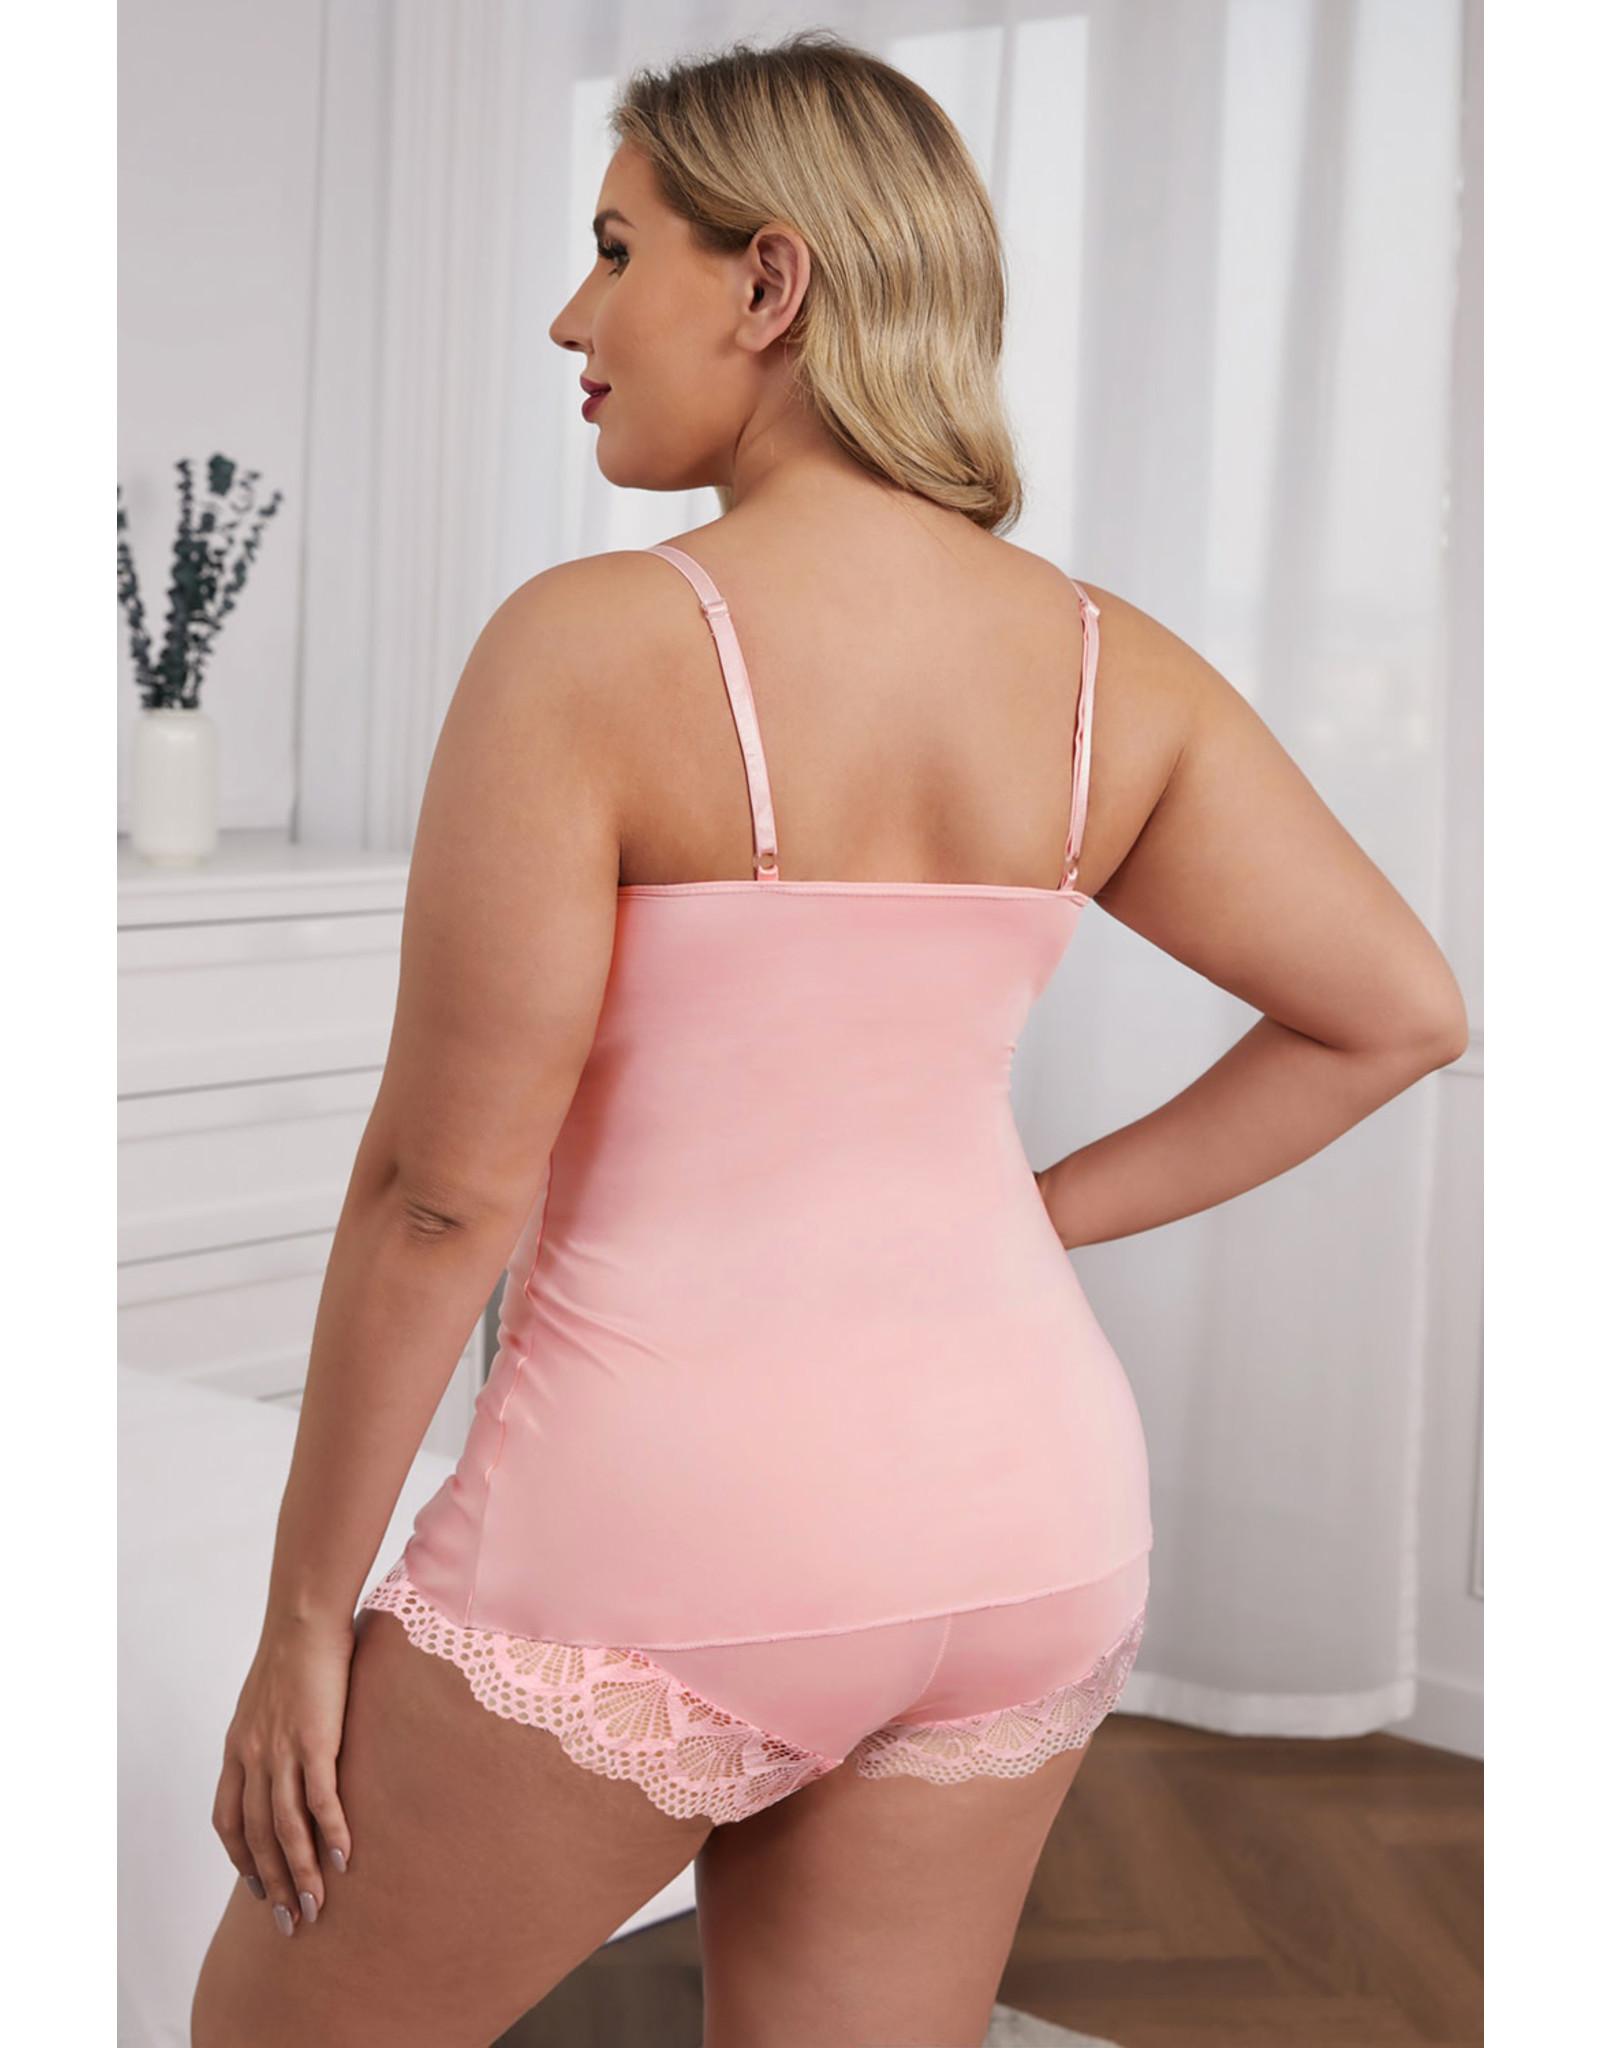 Babylon Pink Lace Cami Top and Shorts  Set 3X